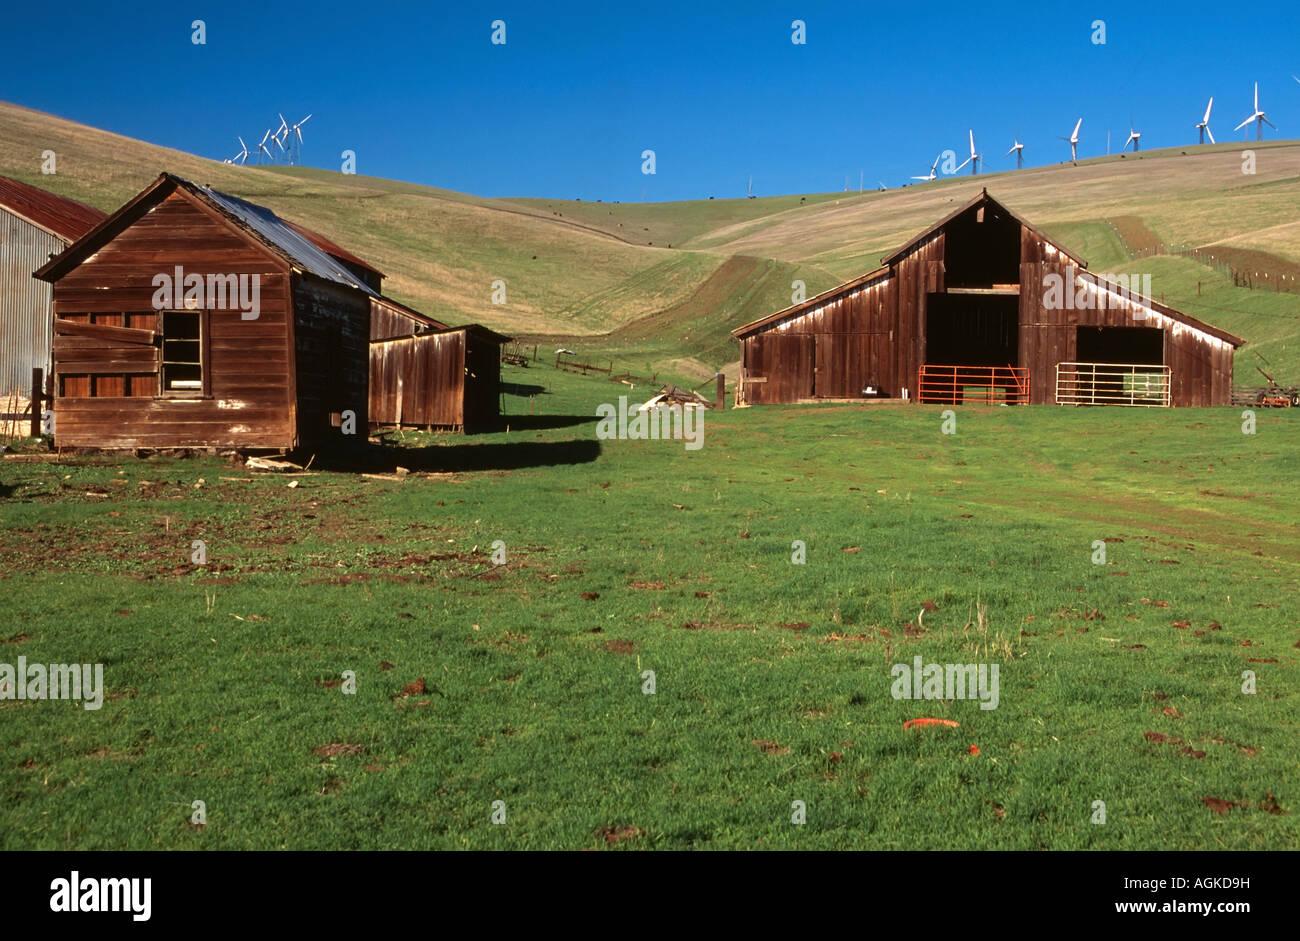 Painet Jm7760 Altamont Pass California Windmill Farm Barn Modern Alternate Renewable Energy Old New Landscape Grass Blue Sky